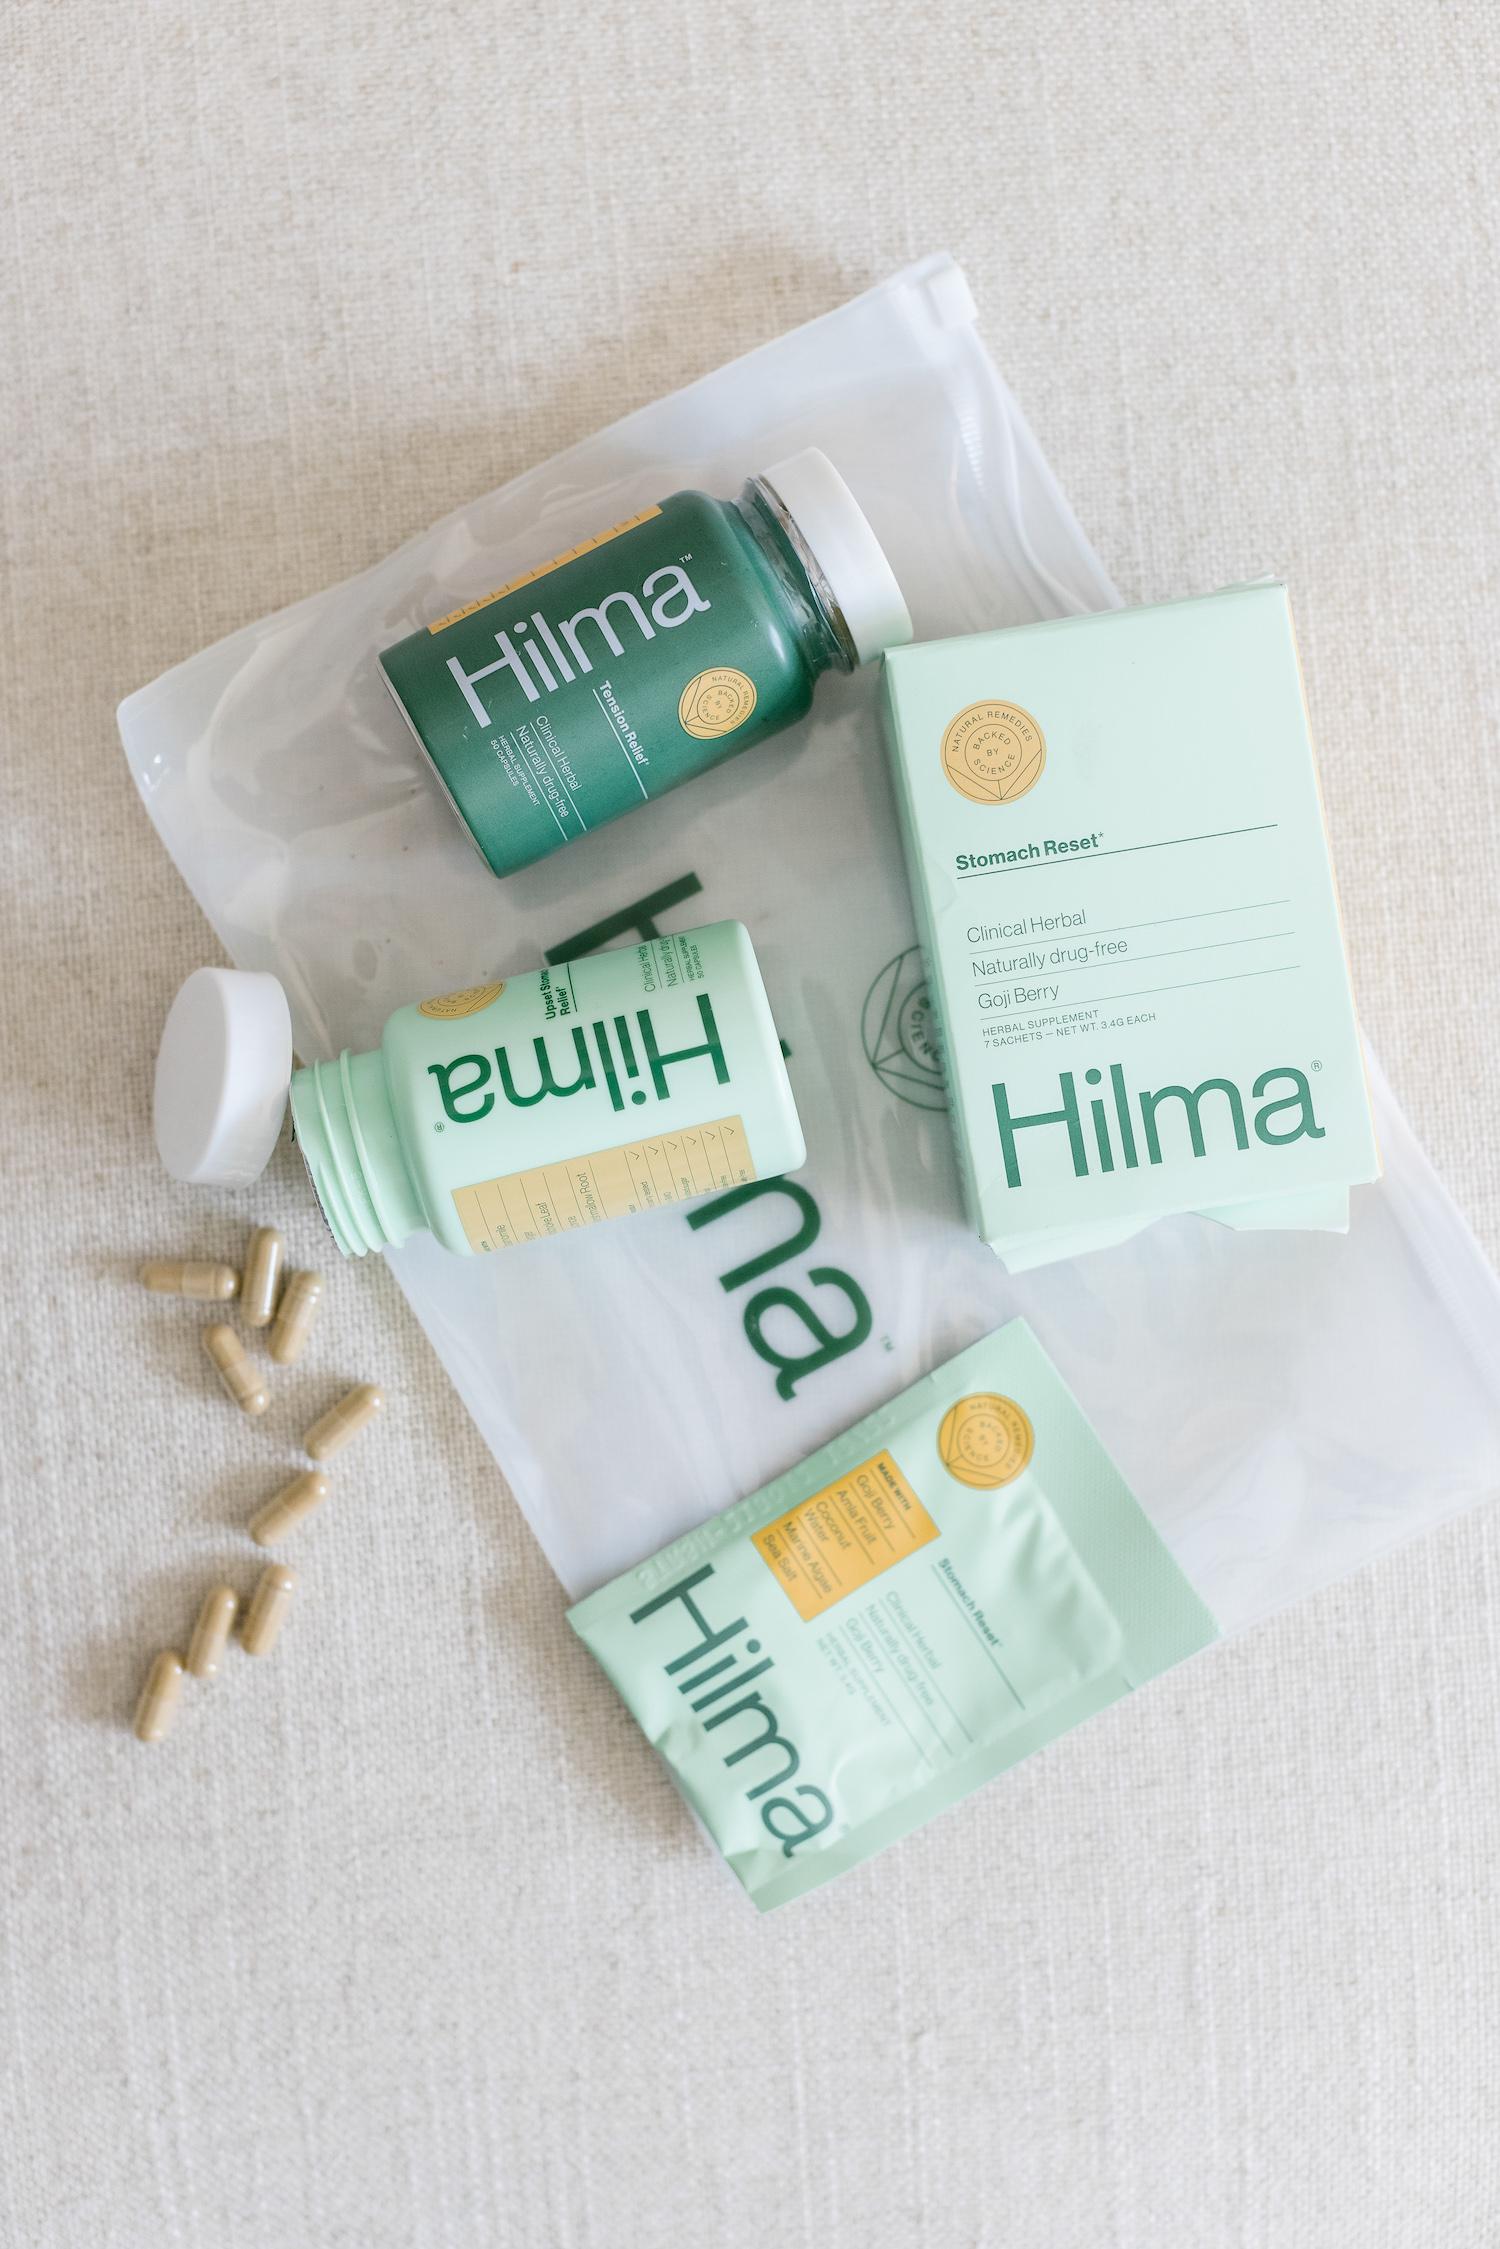 Hilma natural products